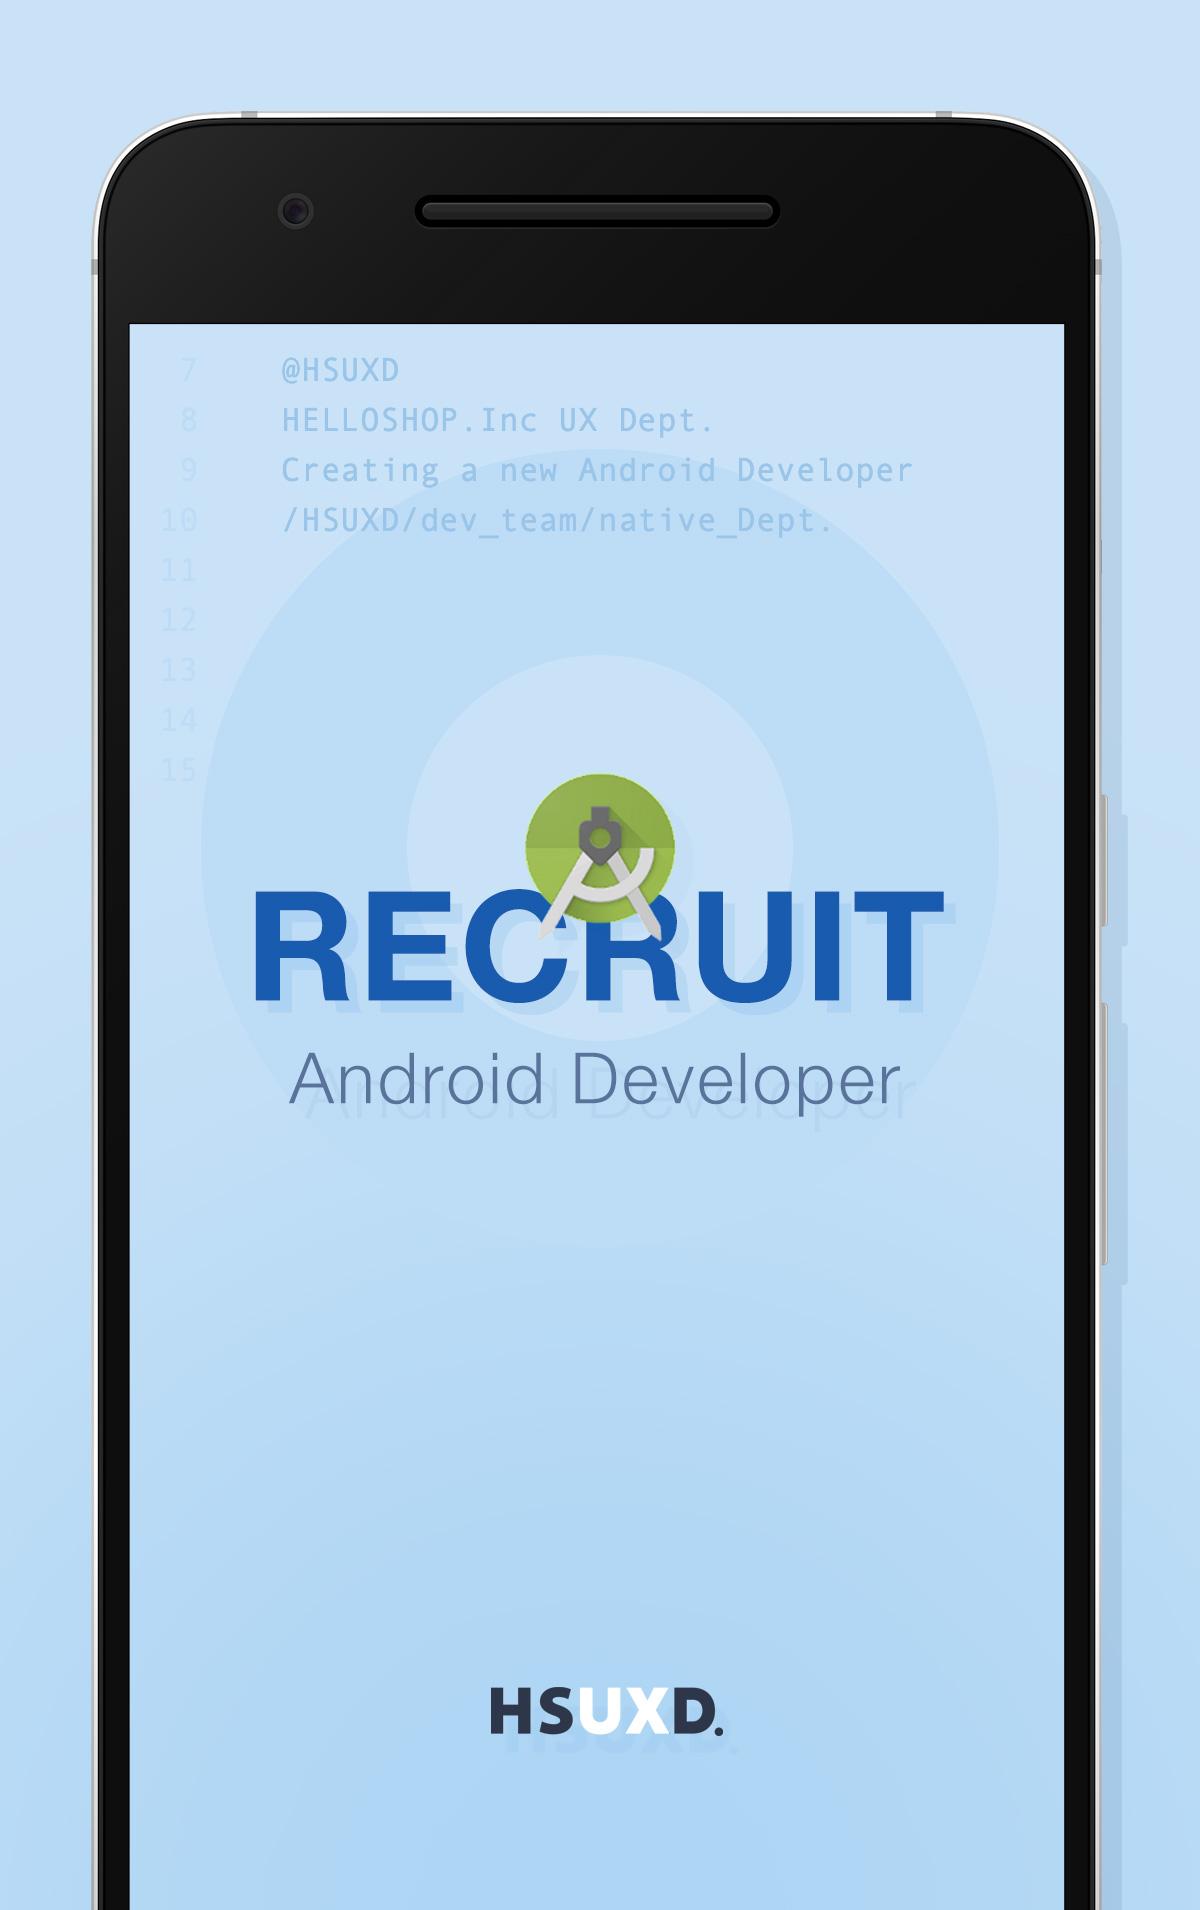 HSUXD - Android 개발자 채용 - JOB